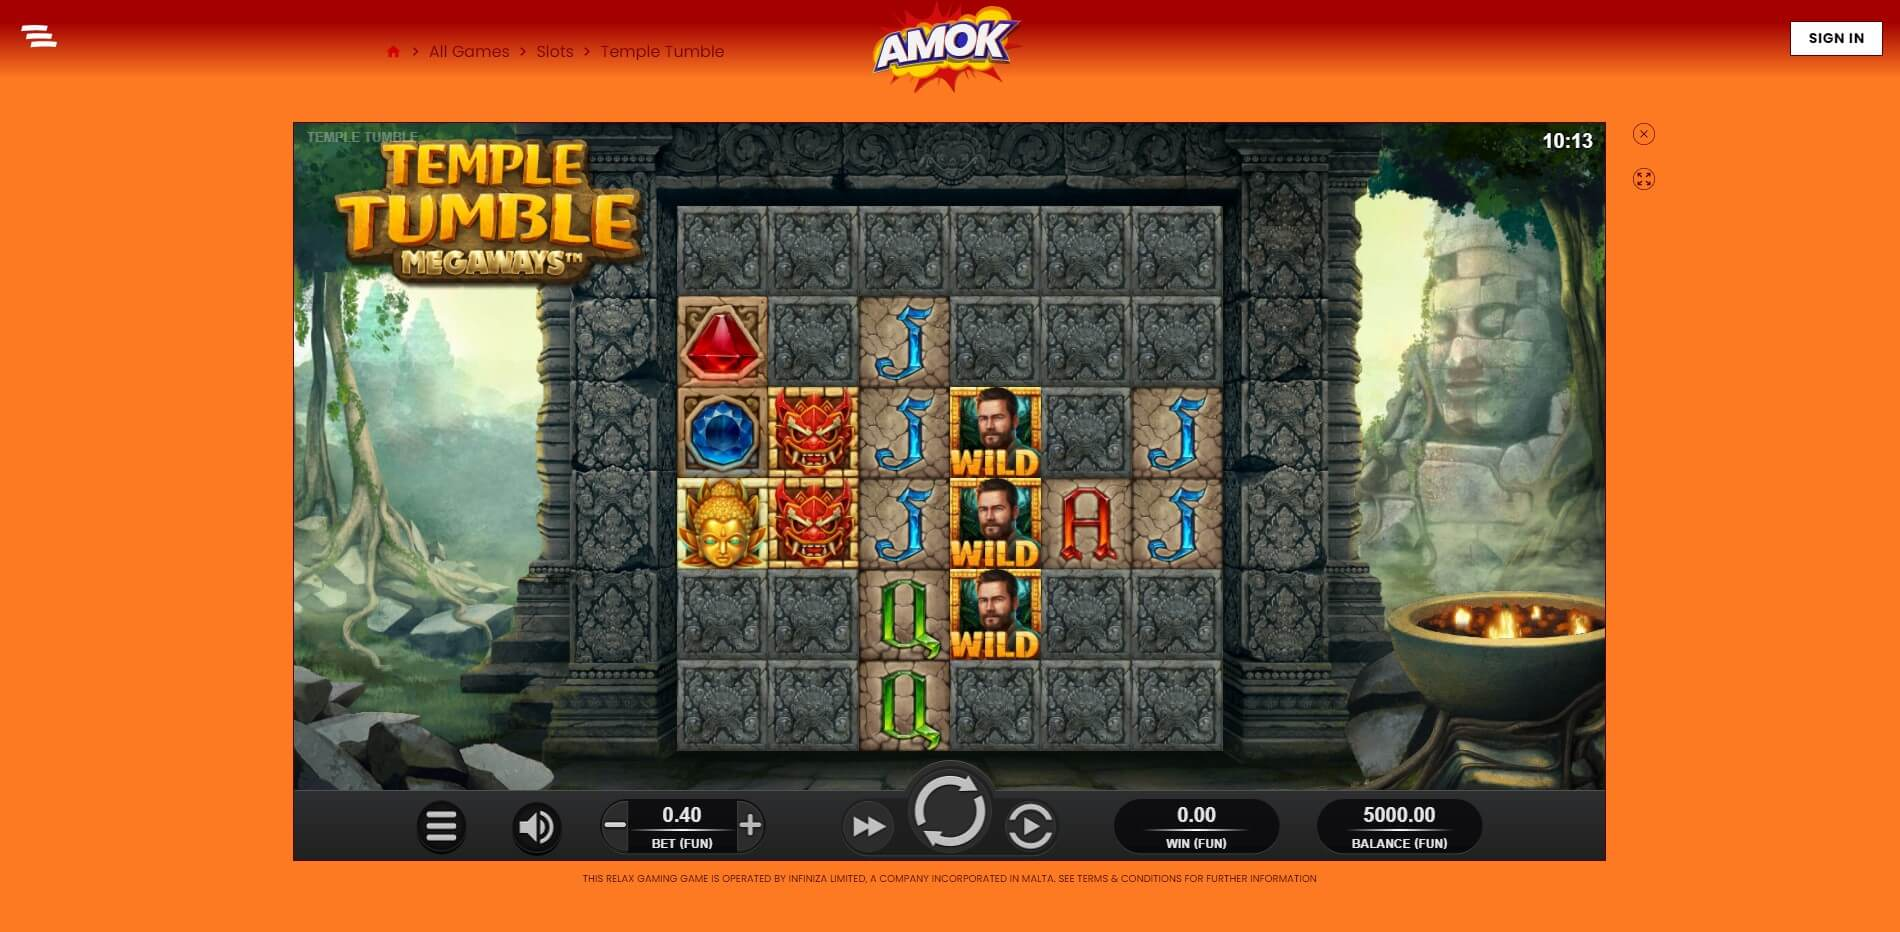 Game Play at Amok Casino